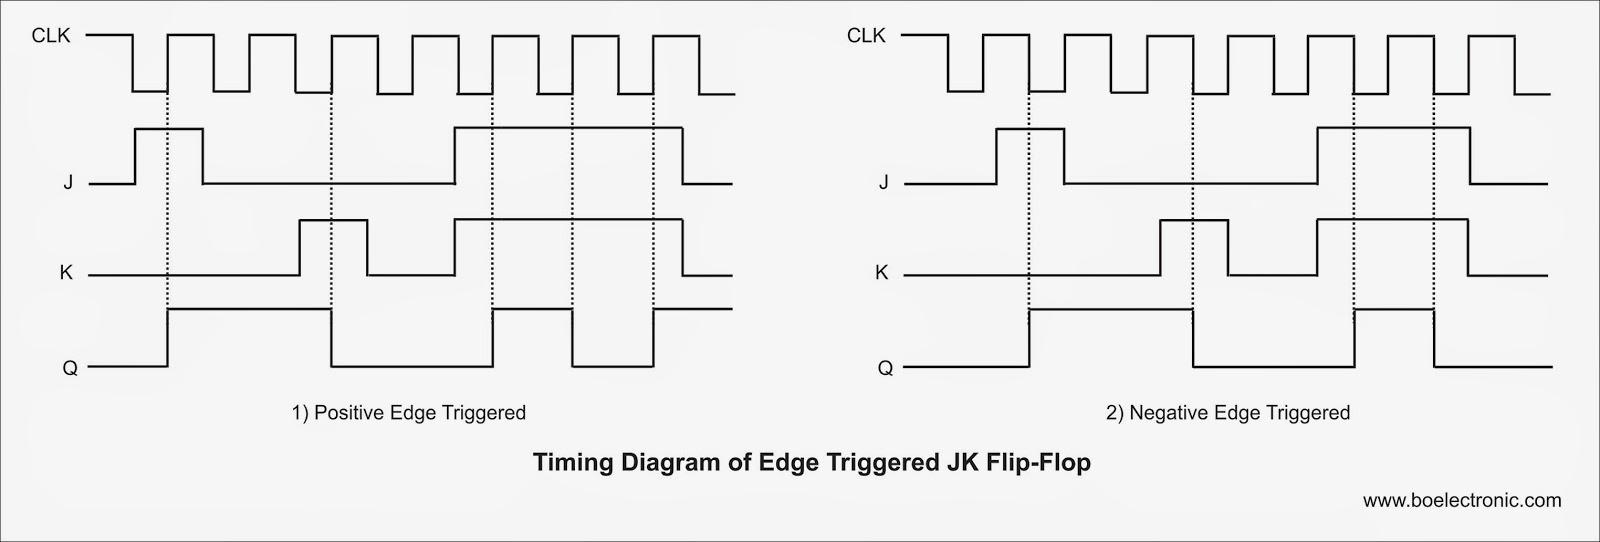 medium resolution of positive edge triggered d flip flop timing diagram d type flip flop elsavadorla negative edge triggered